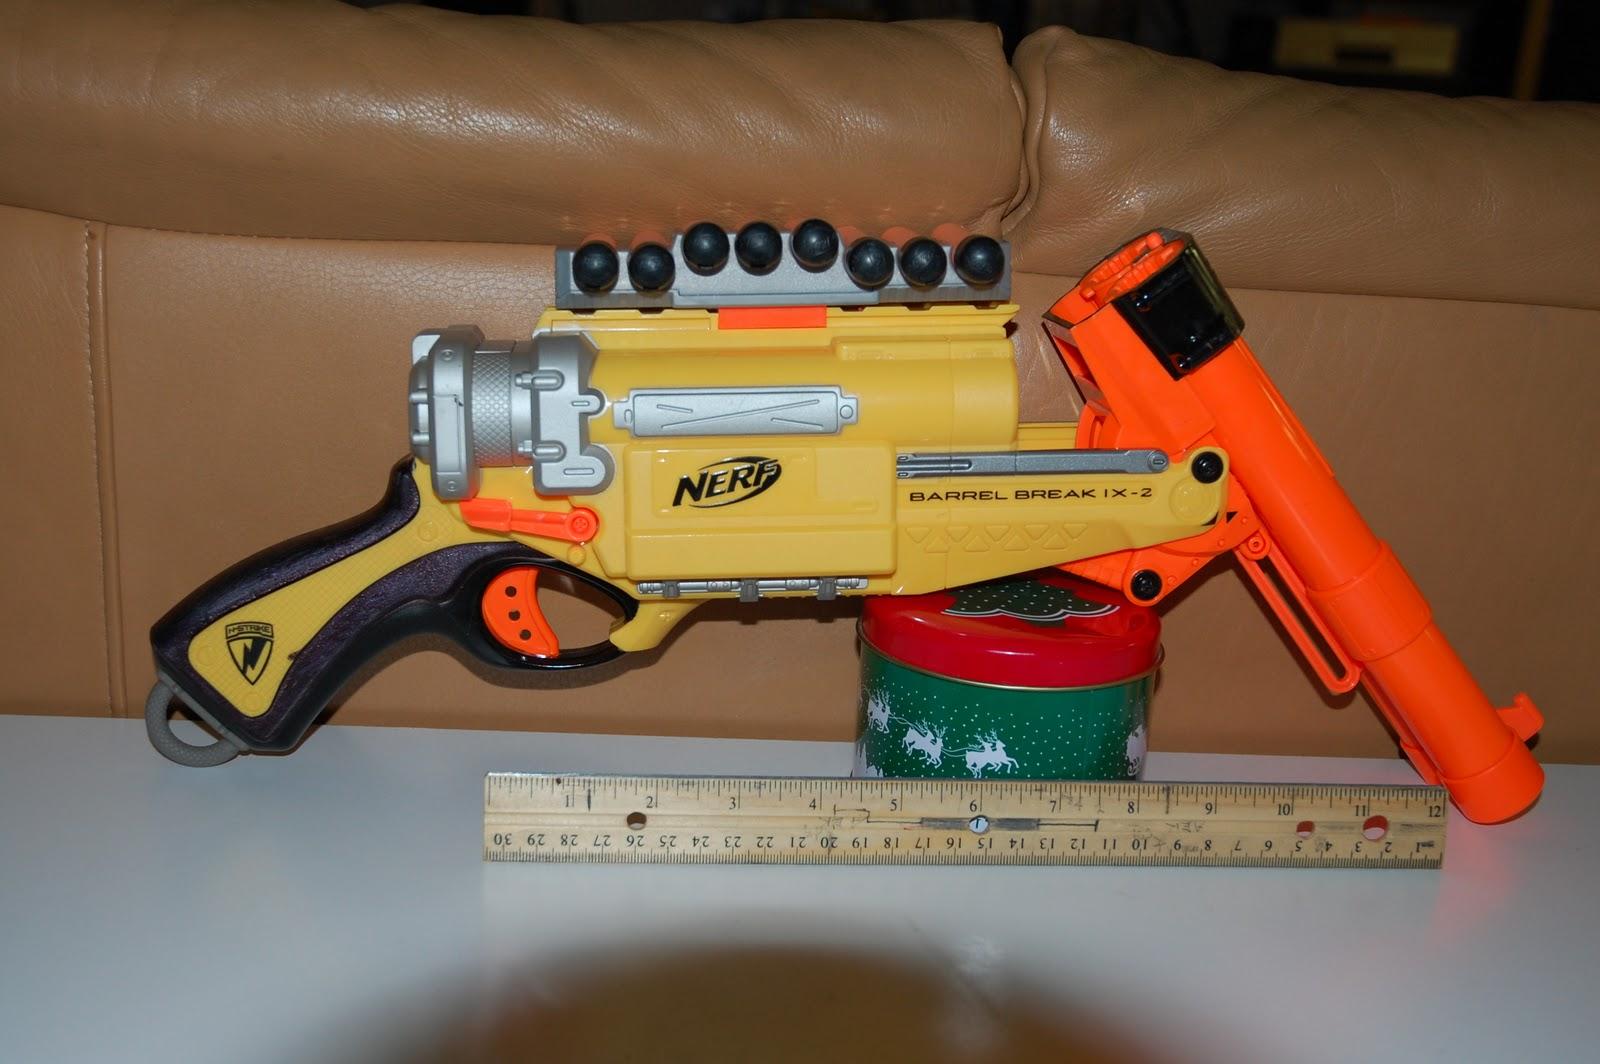 Toys R Us Nerf Guns : Nerf gun reviews barrel break ix